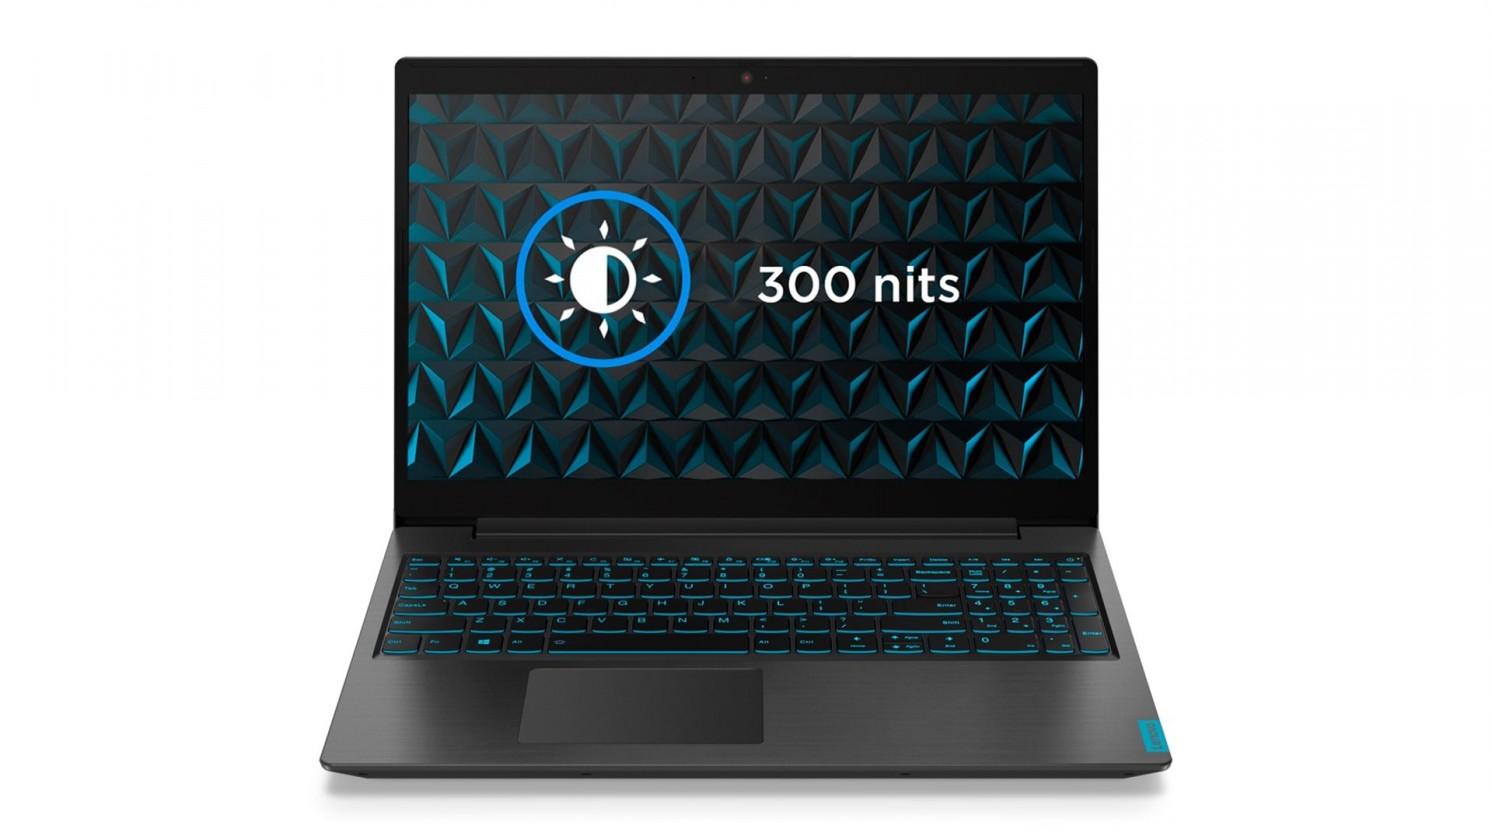 "Herné notebook Herný notebook Lenovo L340 15.6"" i5 8G, SSD 1TB, 3GB, 81LK002XCK"